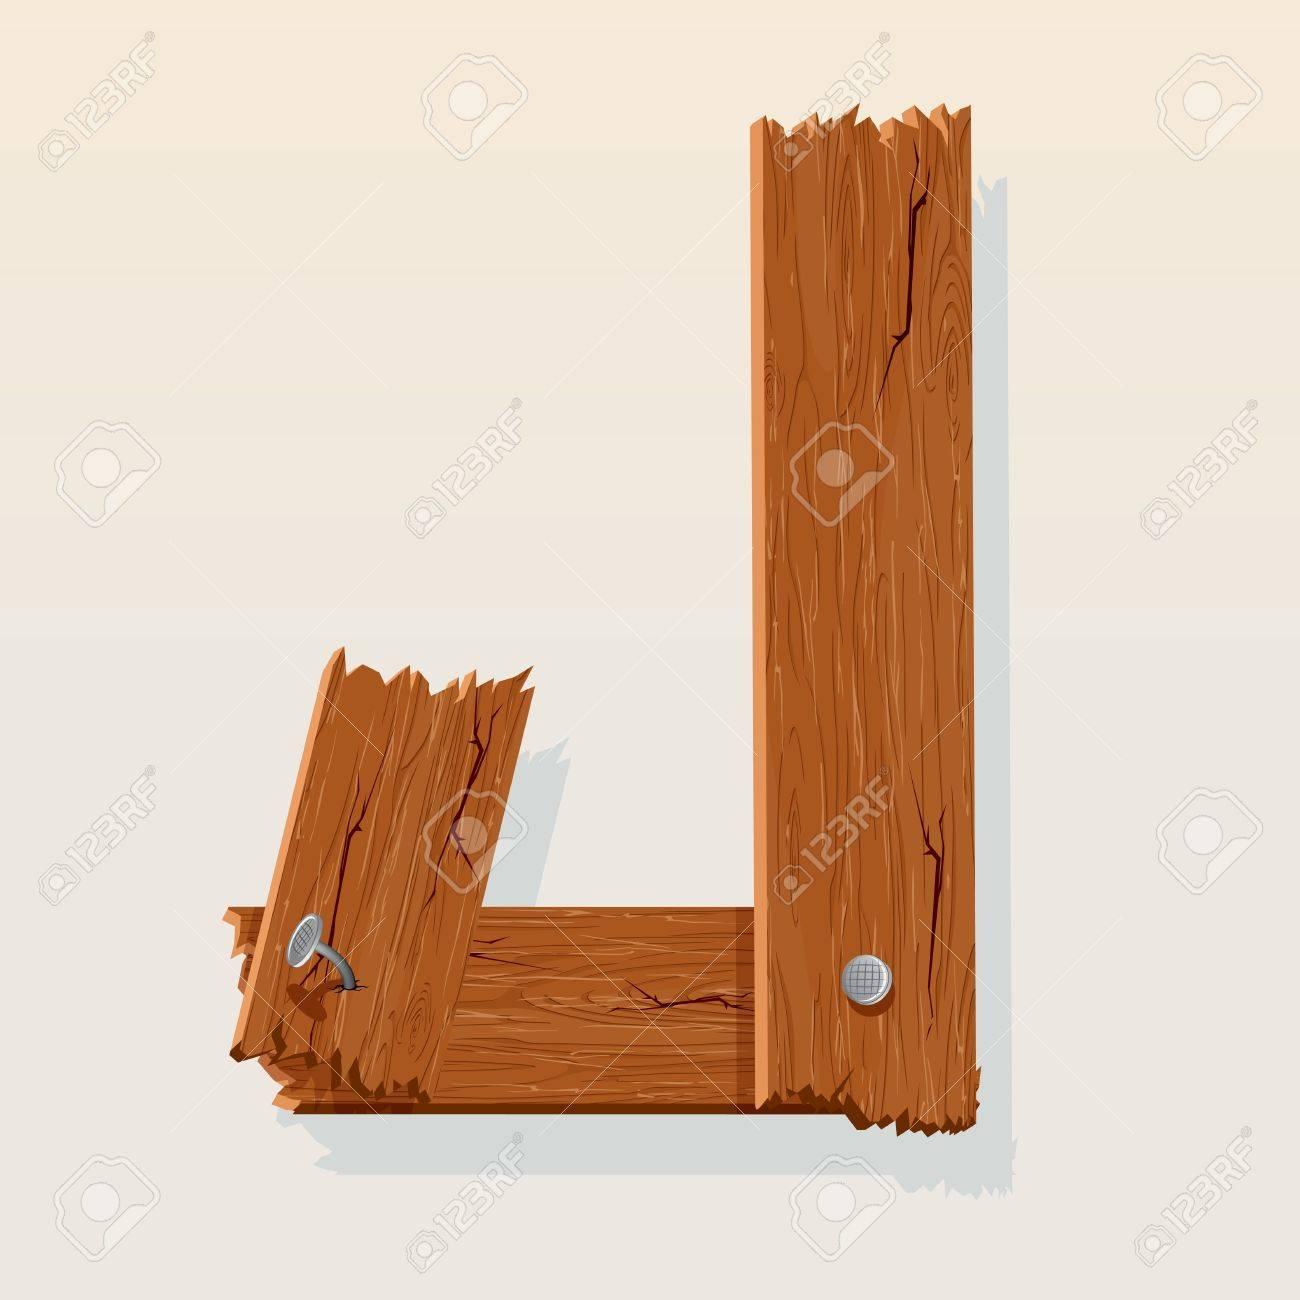 Letter J From vector Wooden Alphabet Stock Vector - 10851012